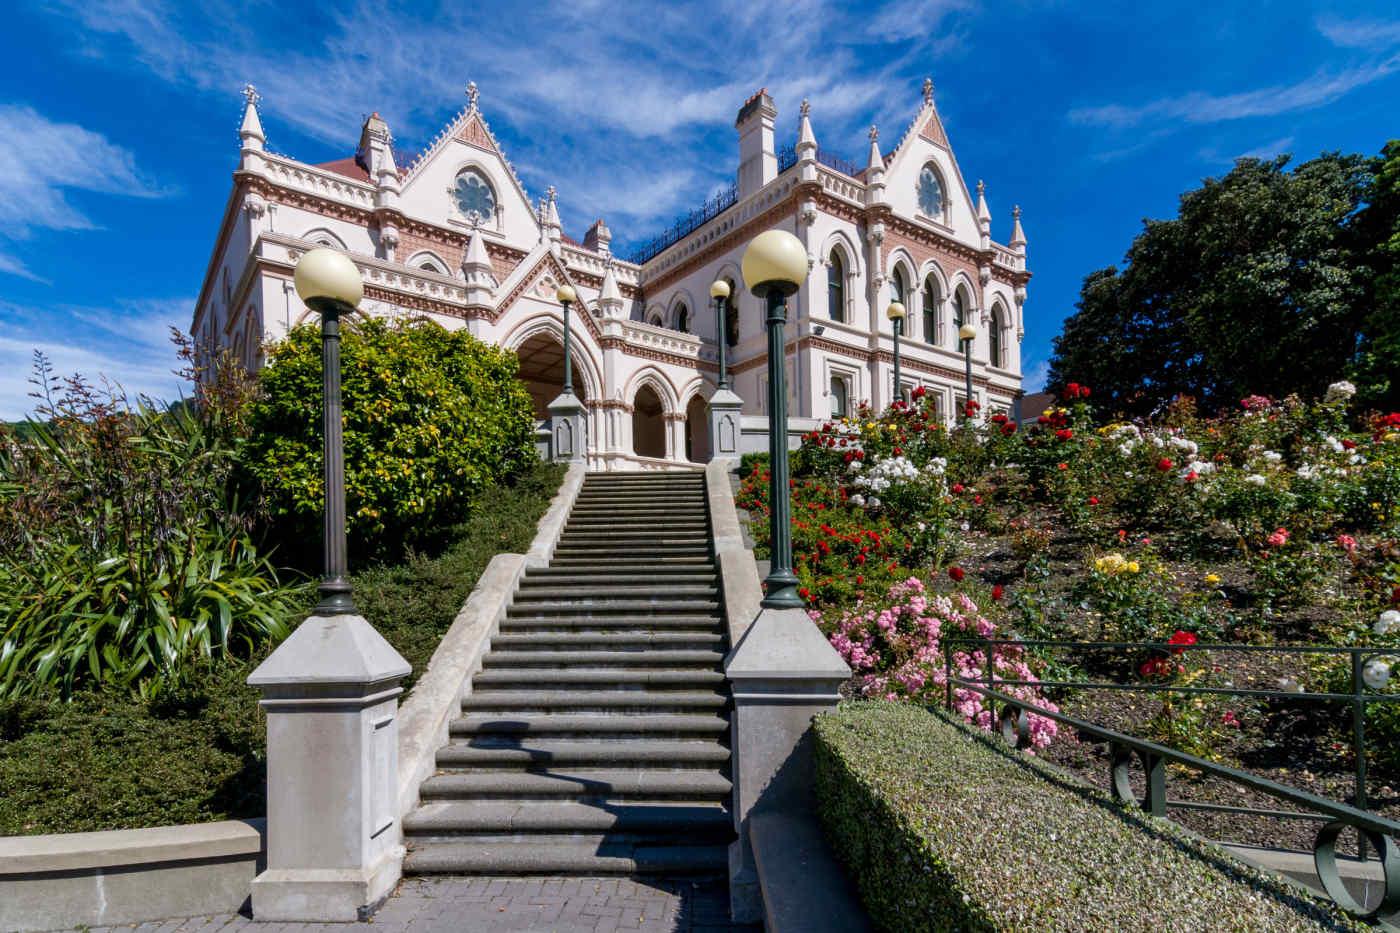 Parliament Building • Wellington, New Zealand